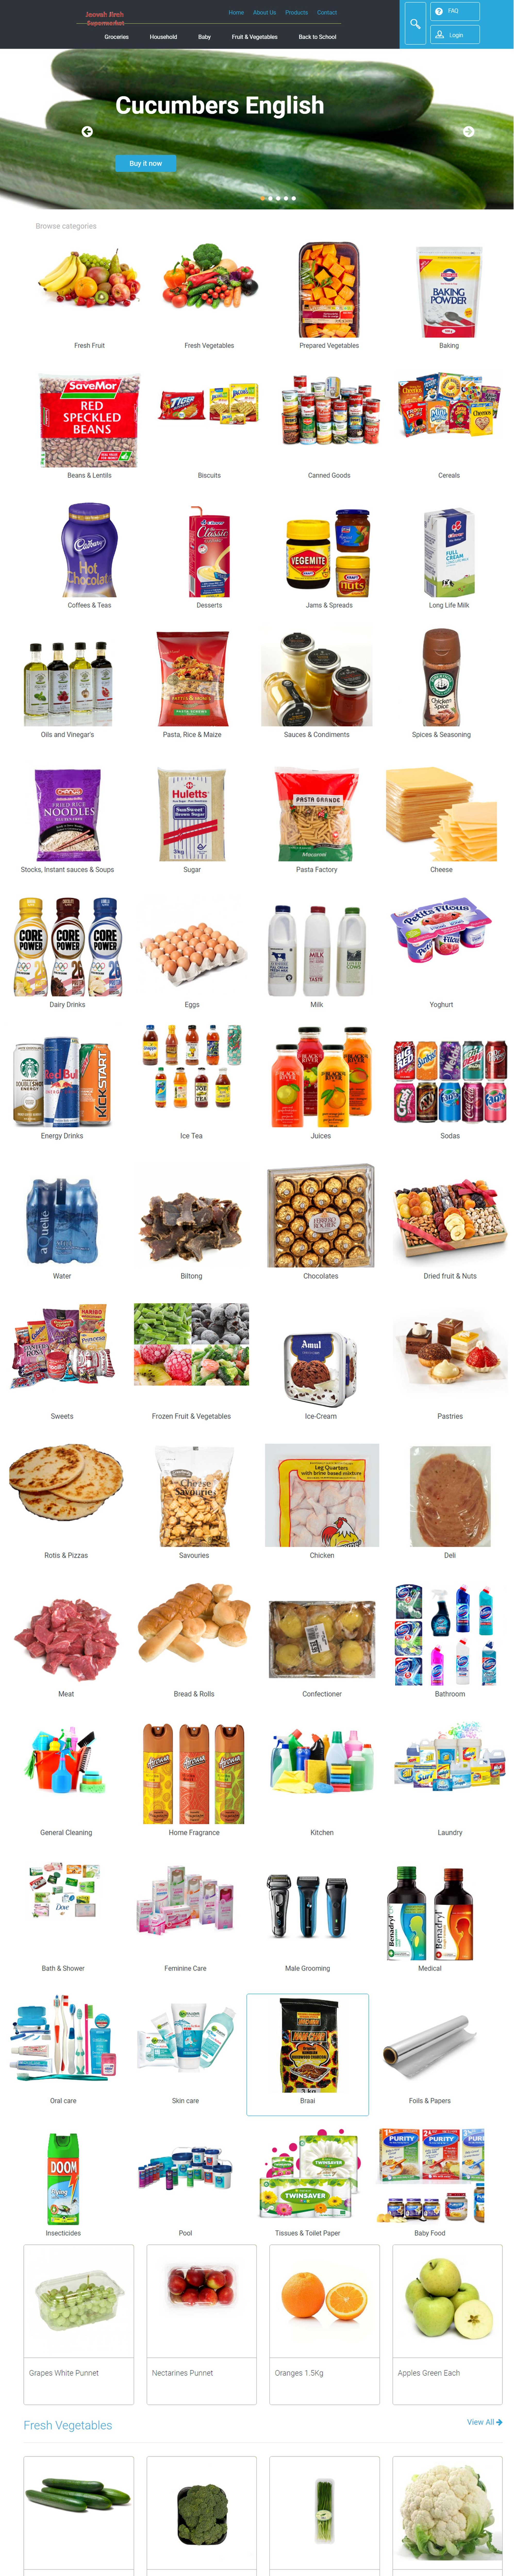 Jeovah Jireh Supermarket